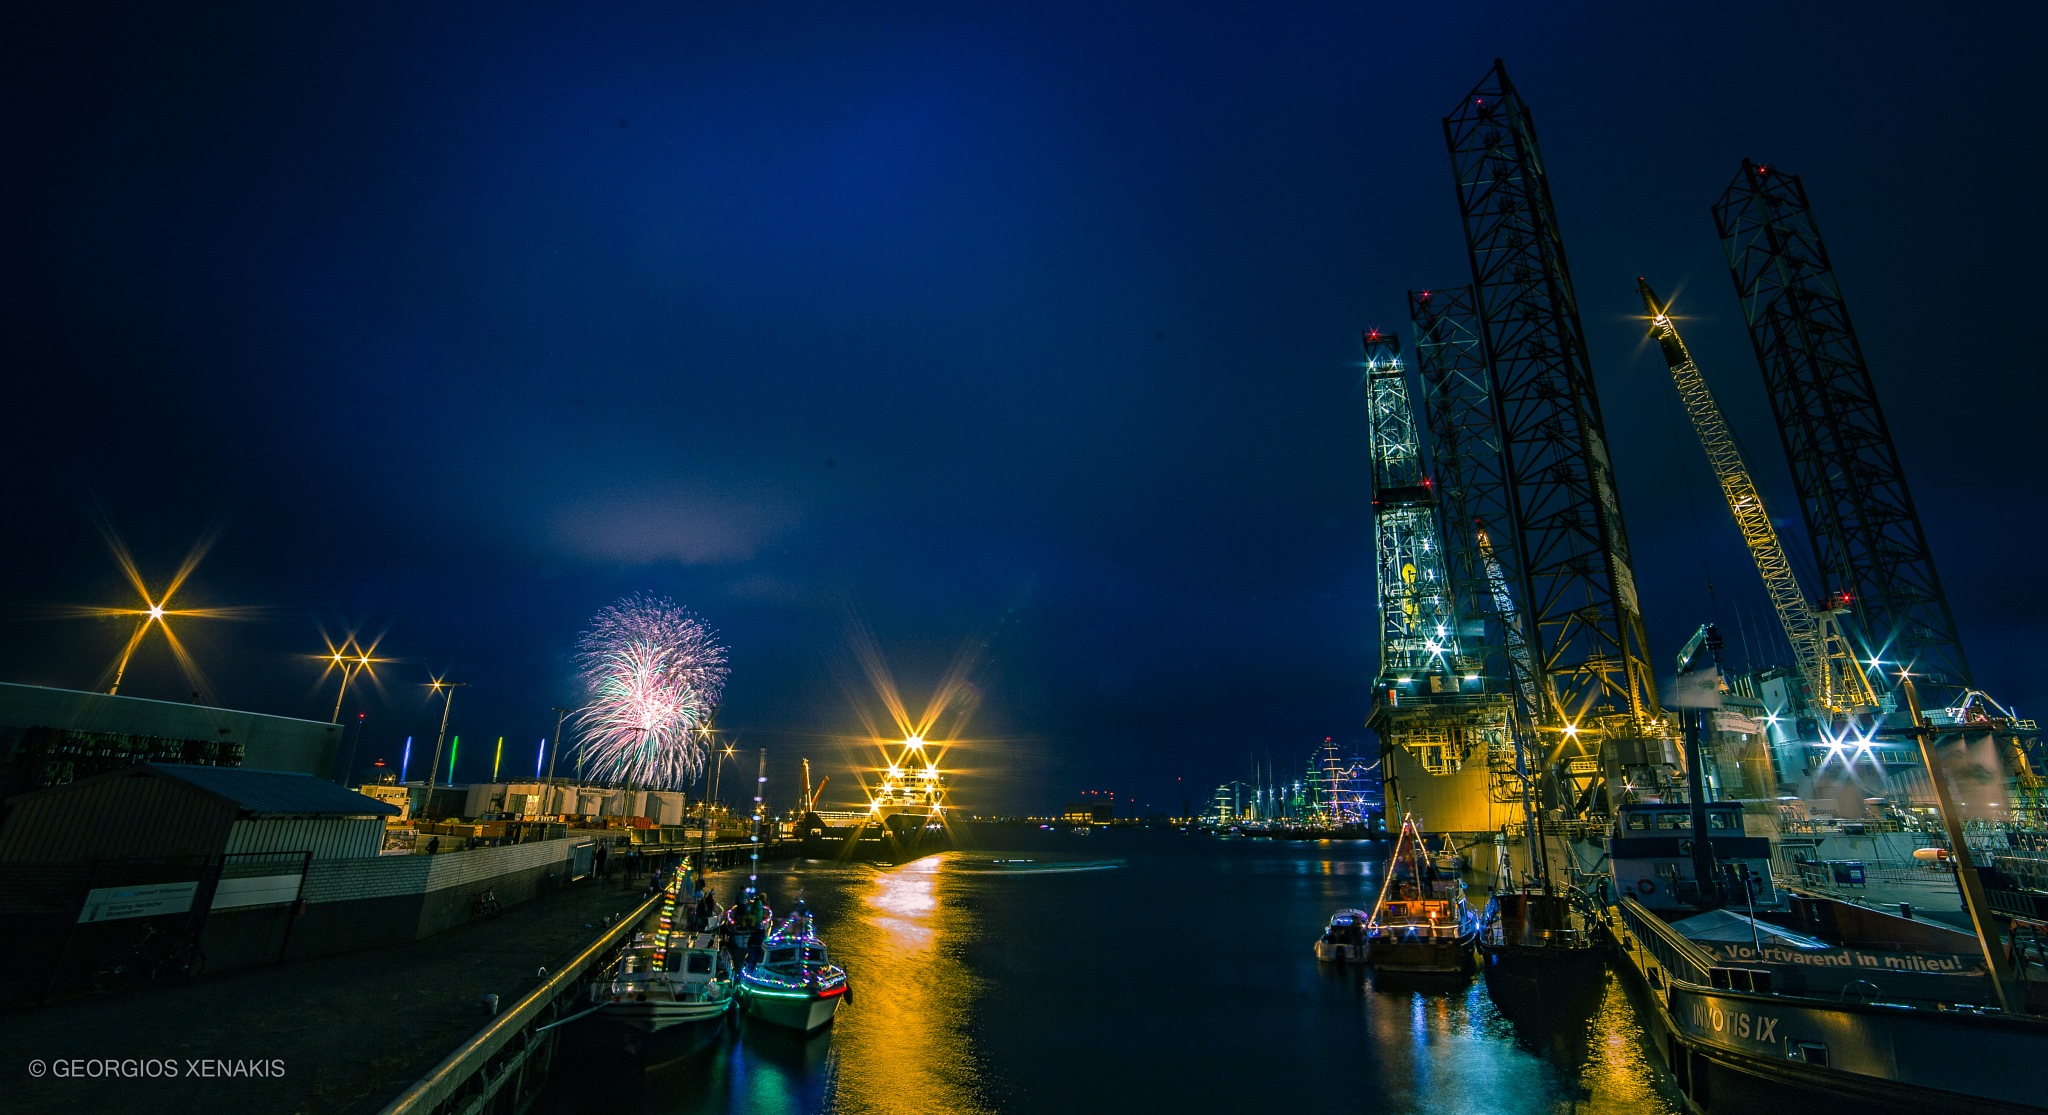 fireworks SAIL Den Helder  by Georgios Xenakis